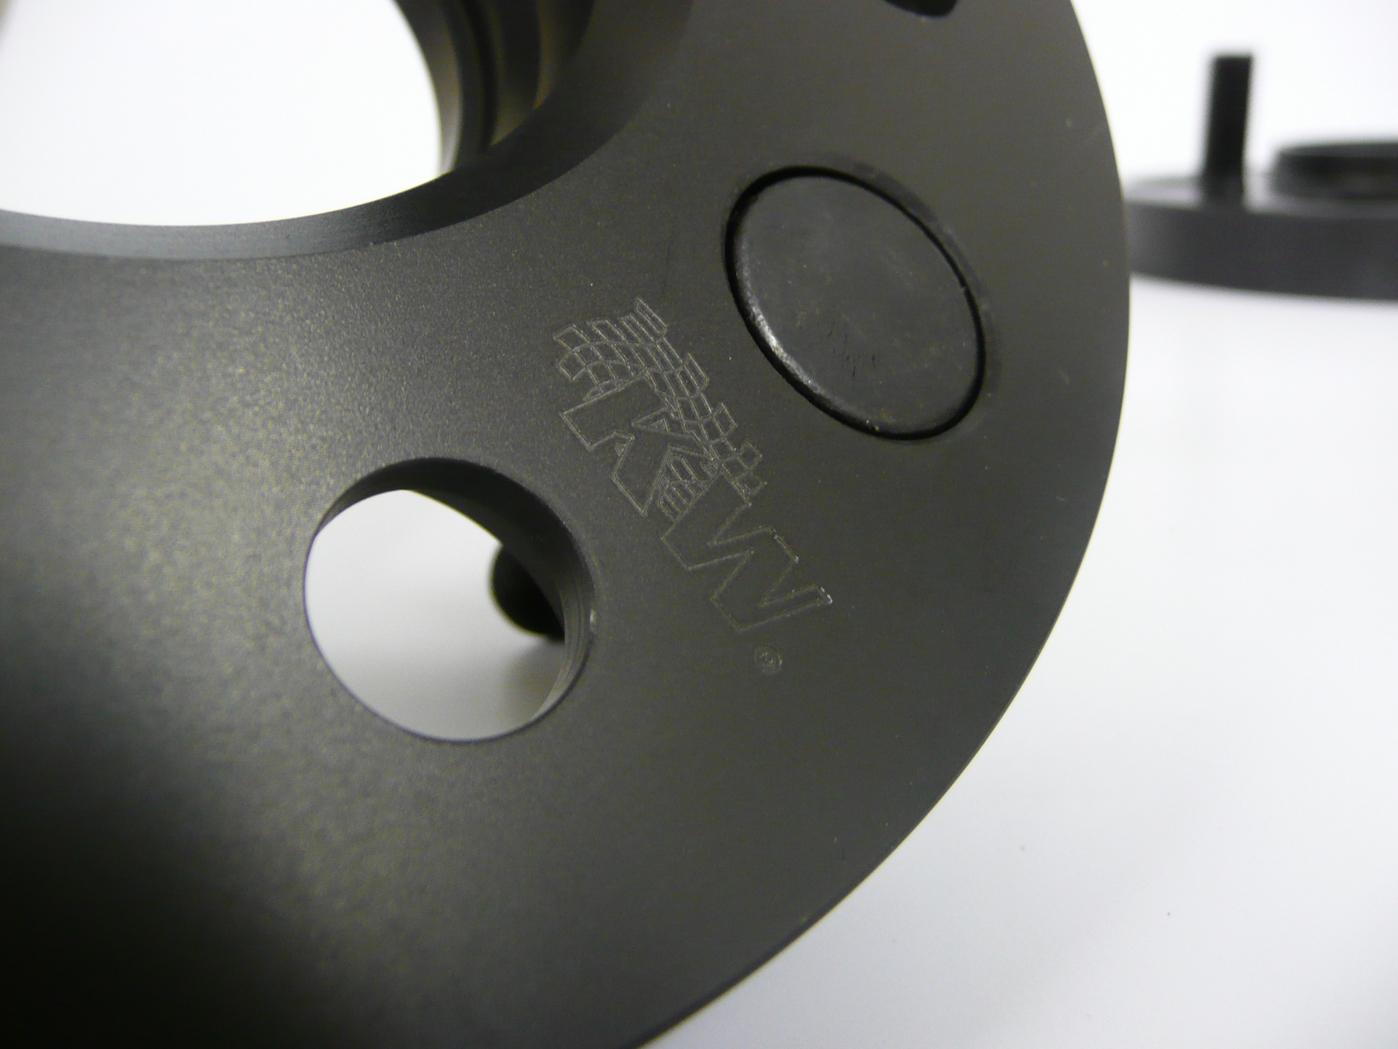 Widening Focus RS Mk2